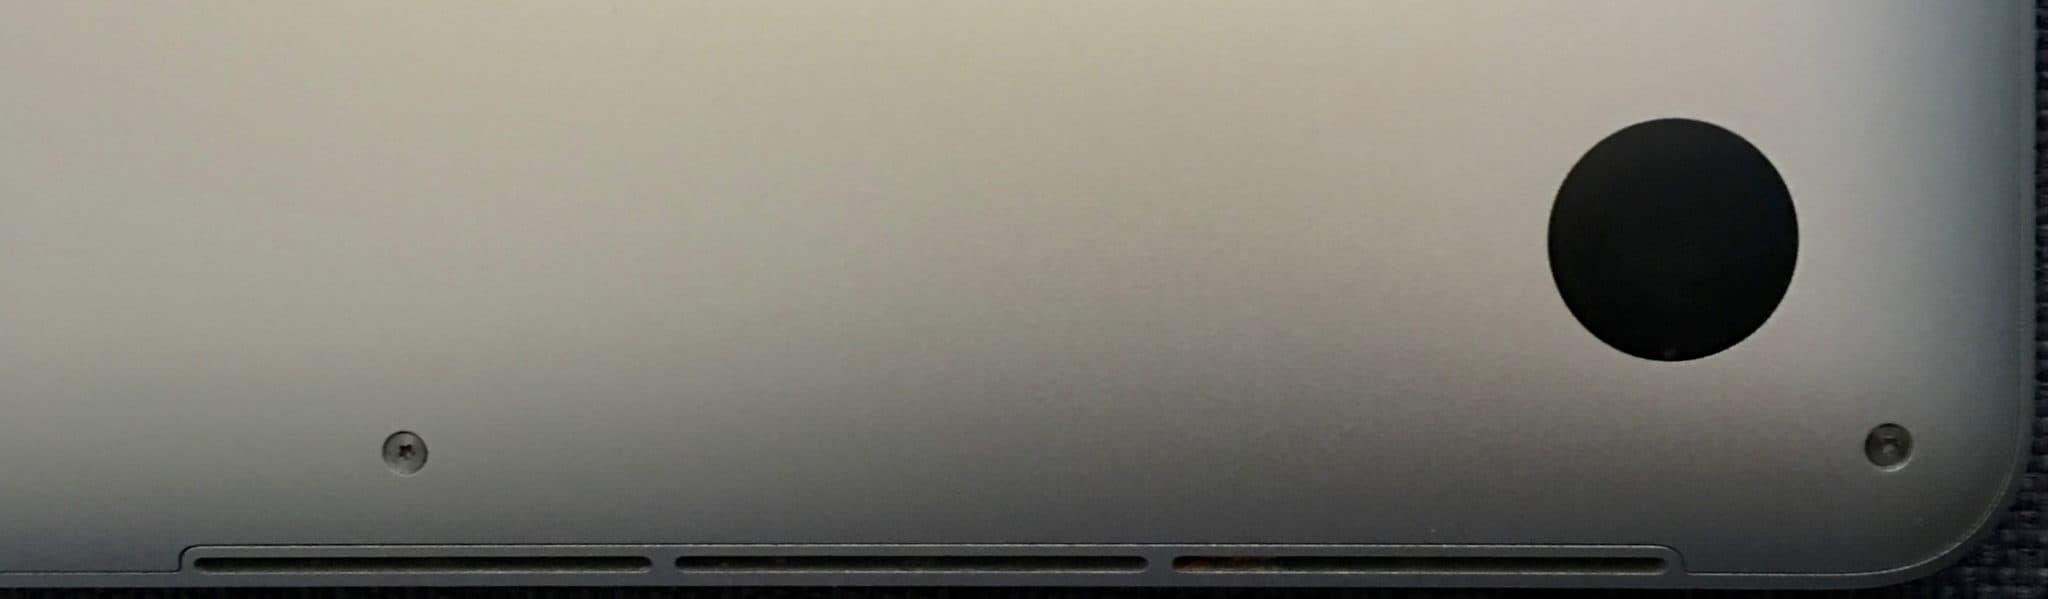 retina macbook pro bottom vent